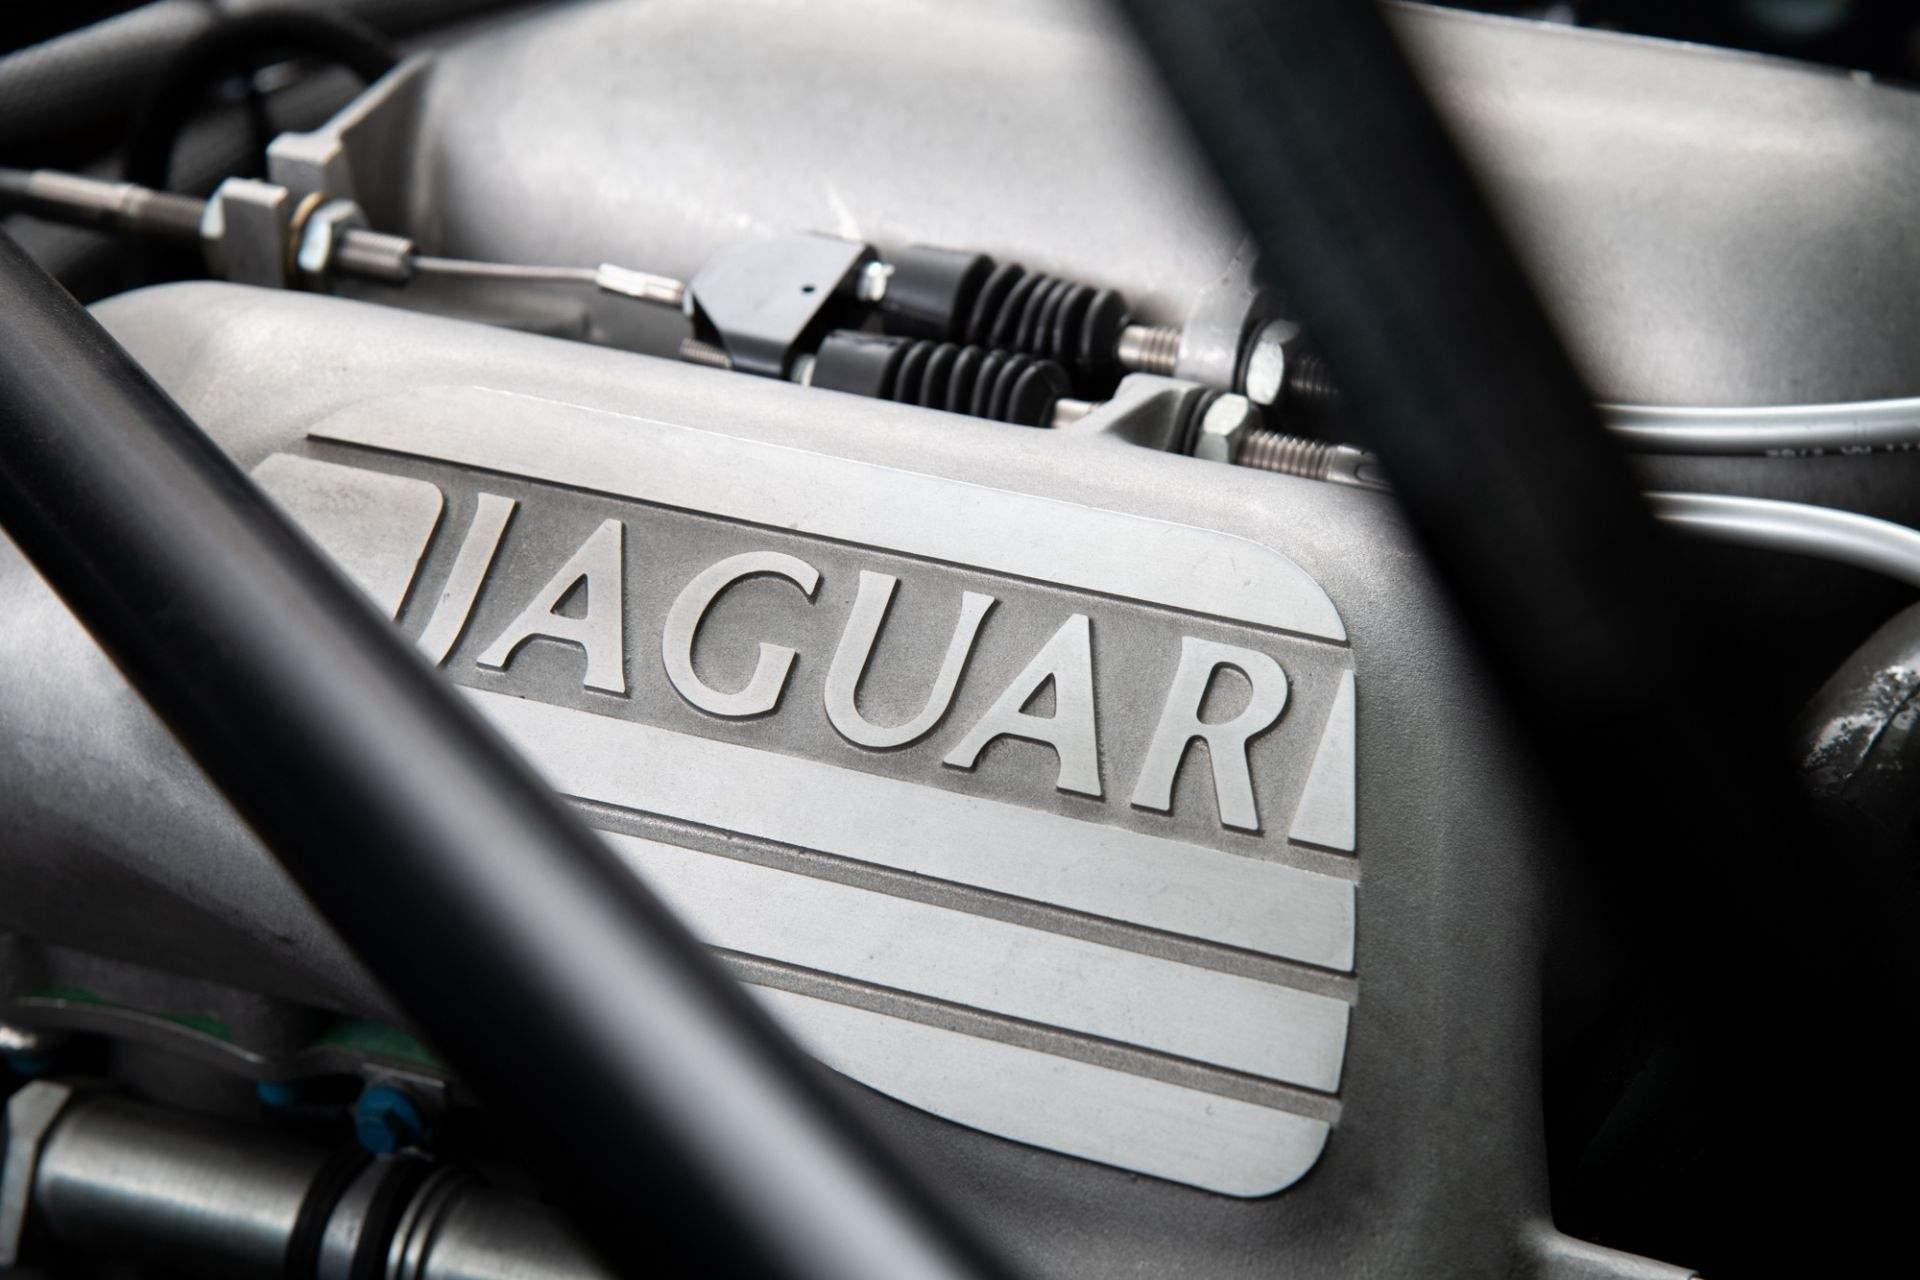 1993_Jaguar_XJ220_sale-0012